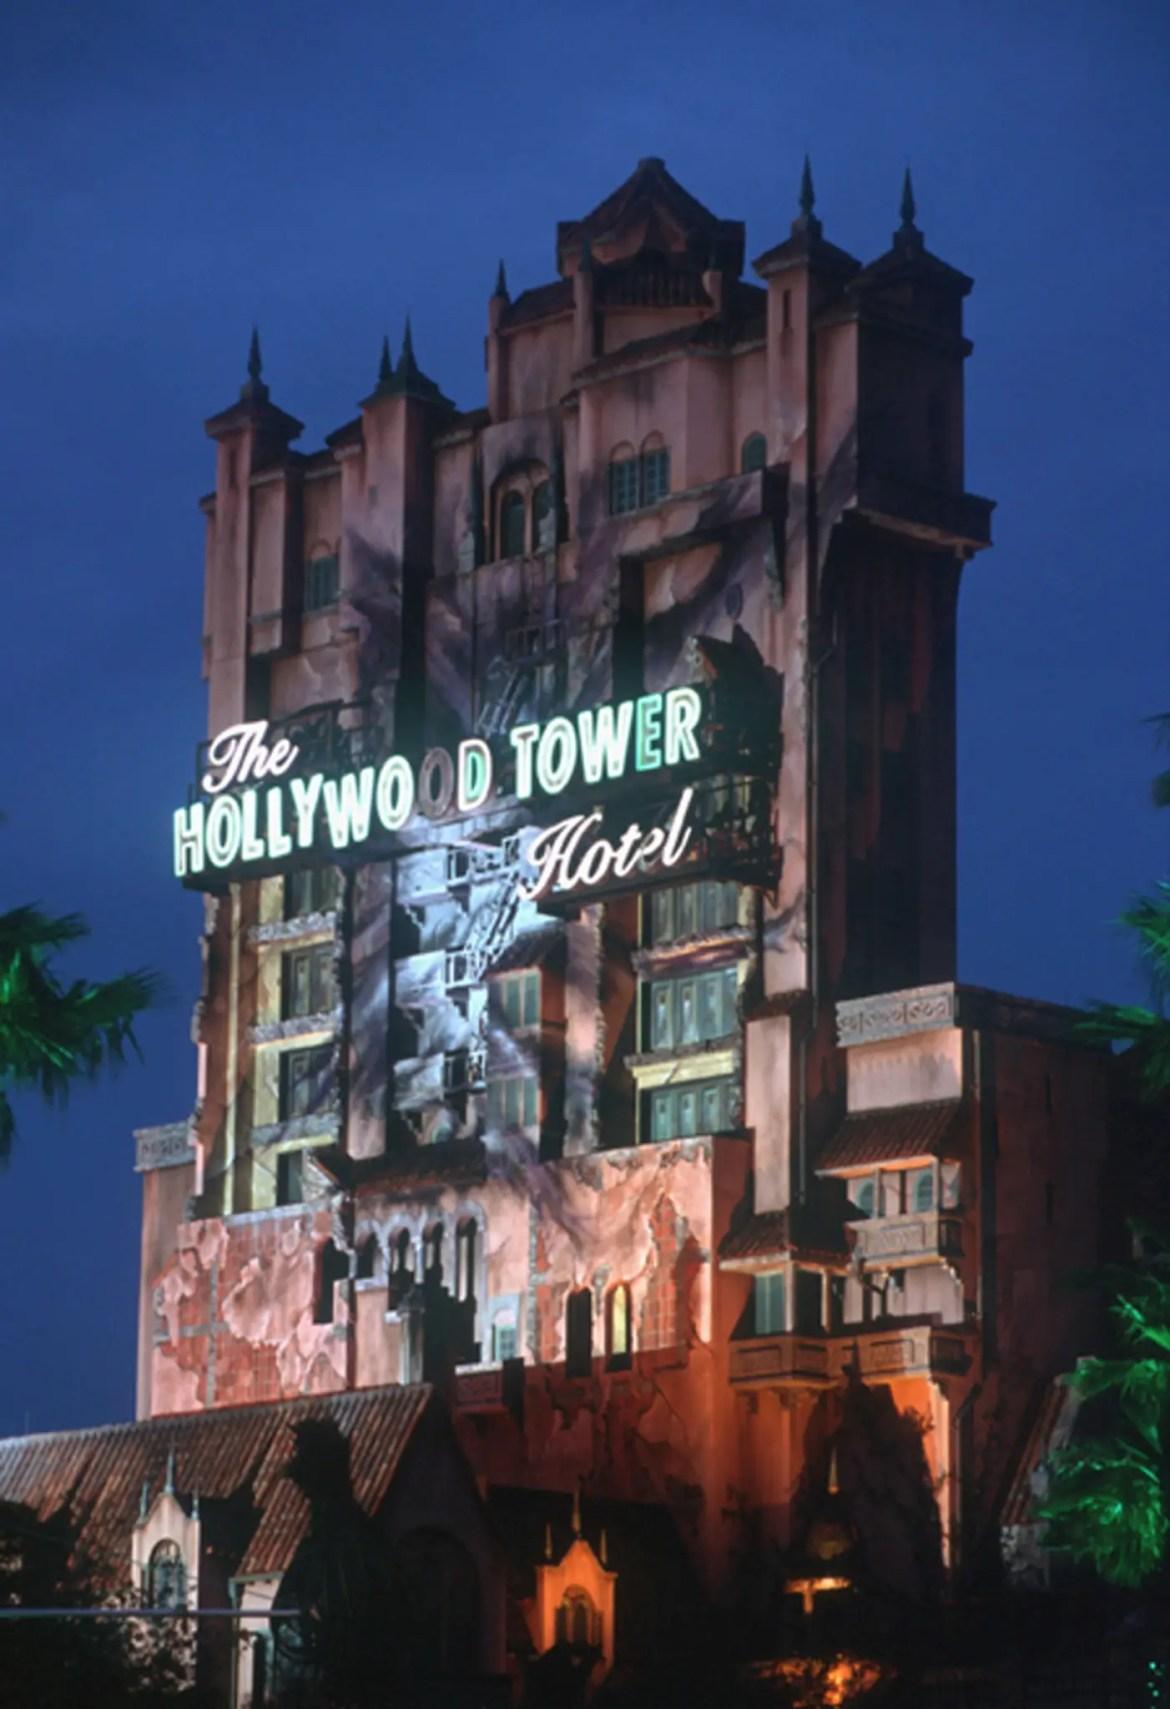 The Twilight Zone Tower of Terror 10 Miler Weekend at Walt Disney World